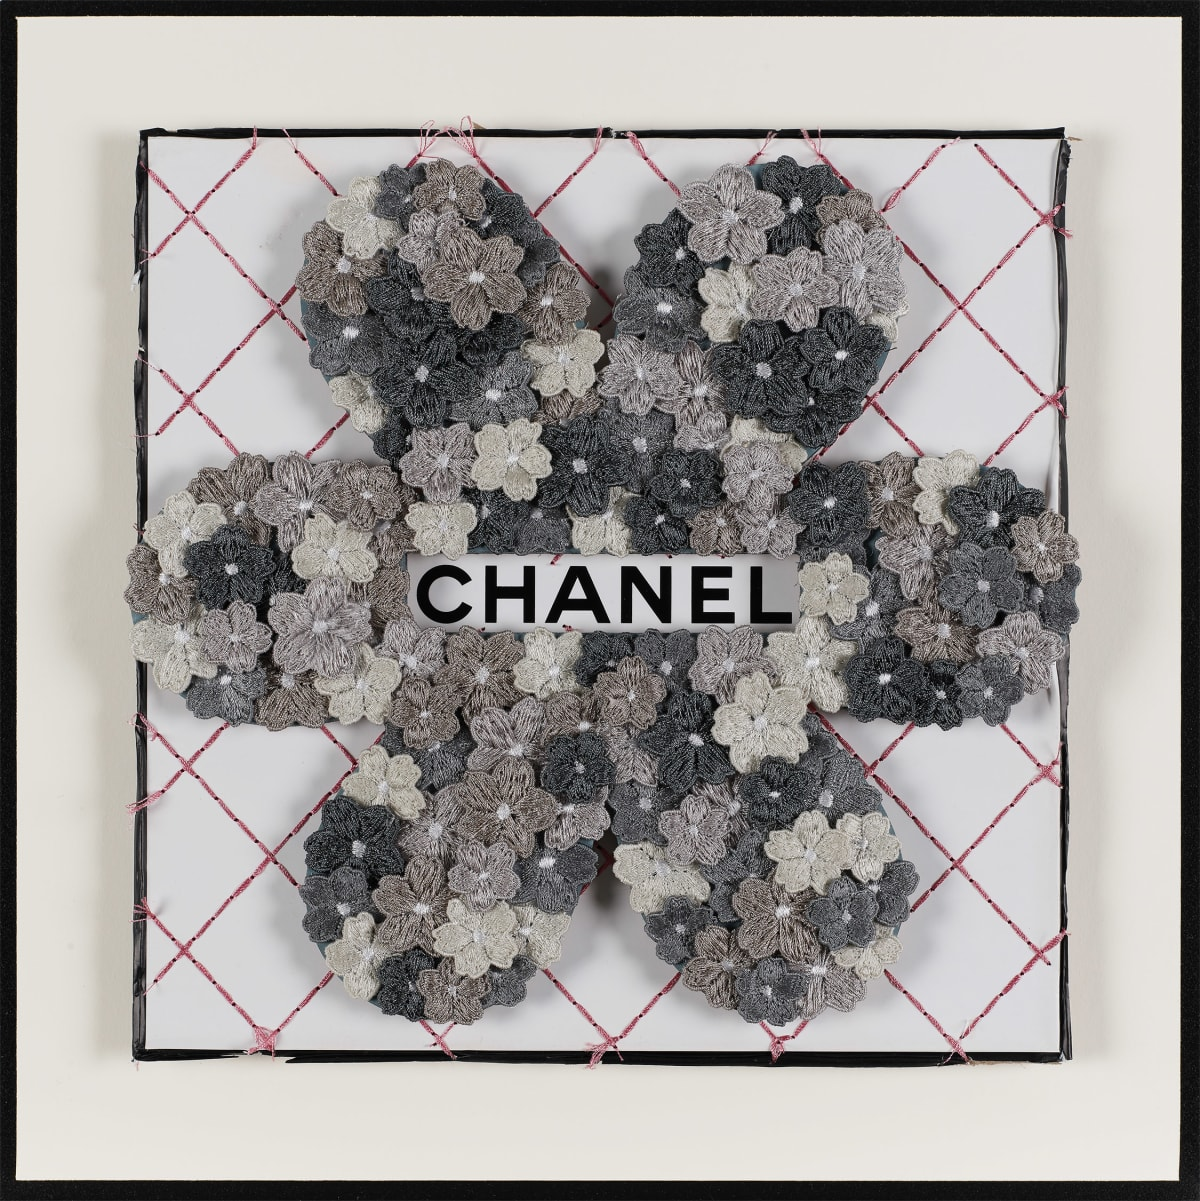 Stephen Wilson, Chanel Flower Flower, Grey, 2019